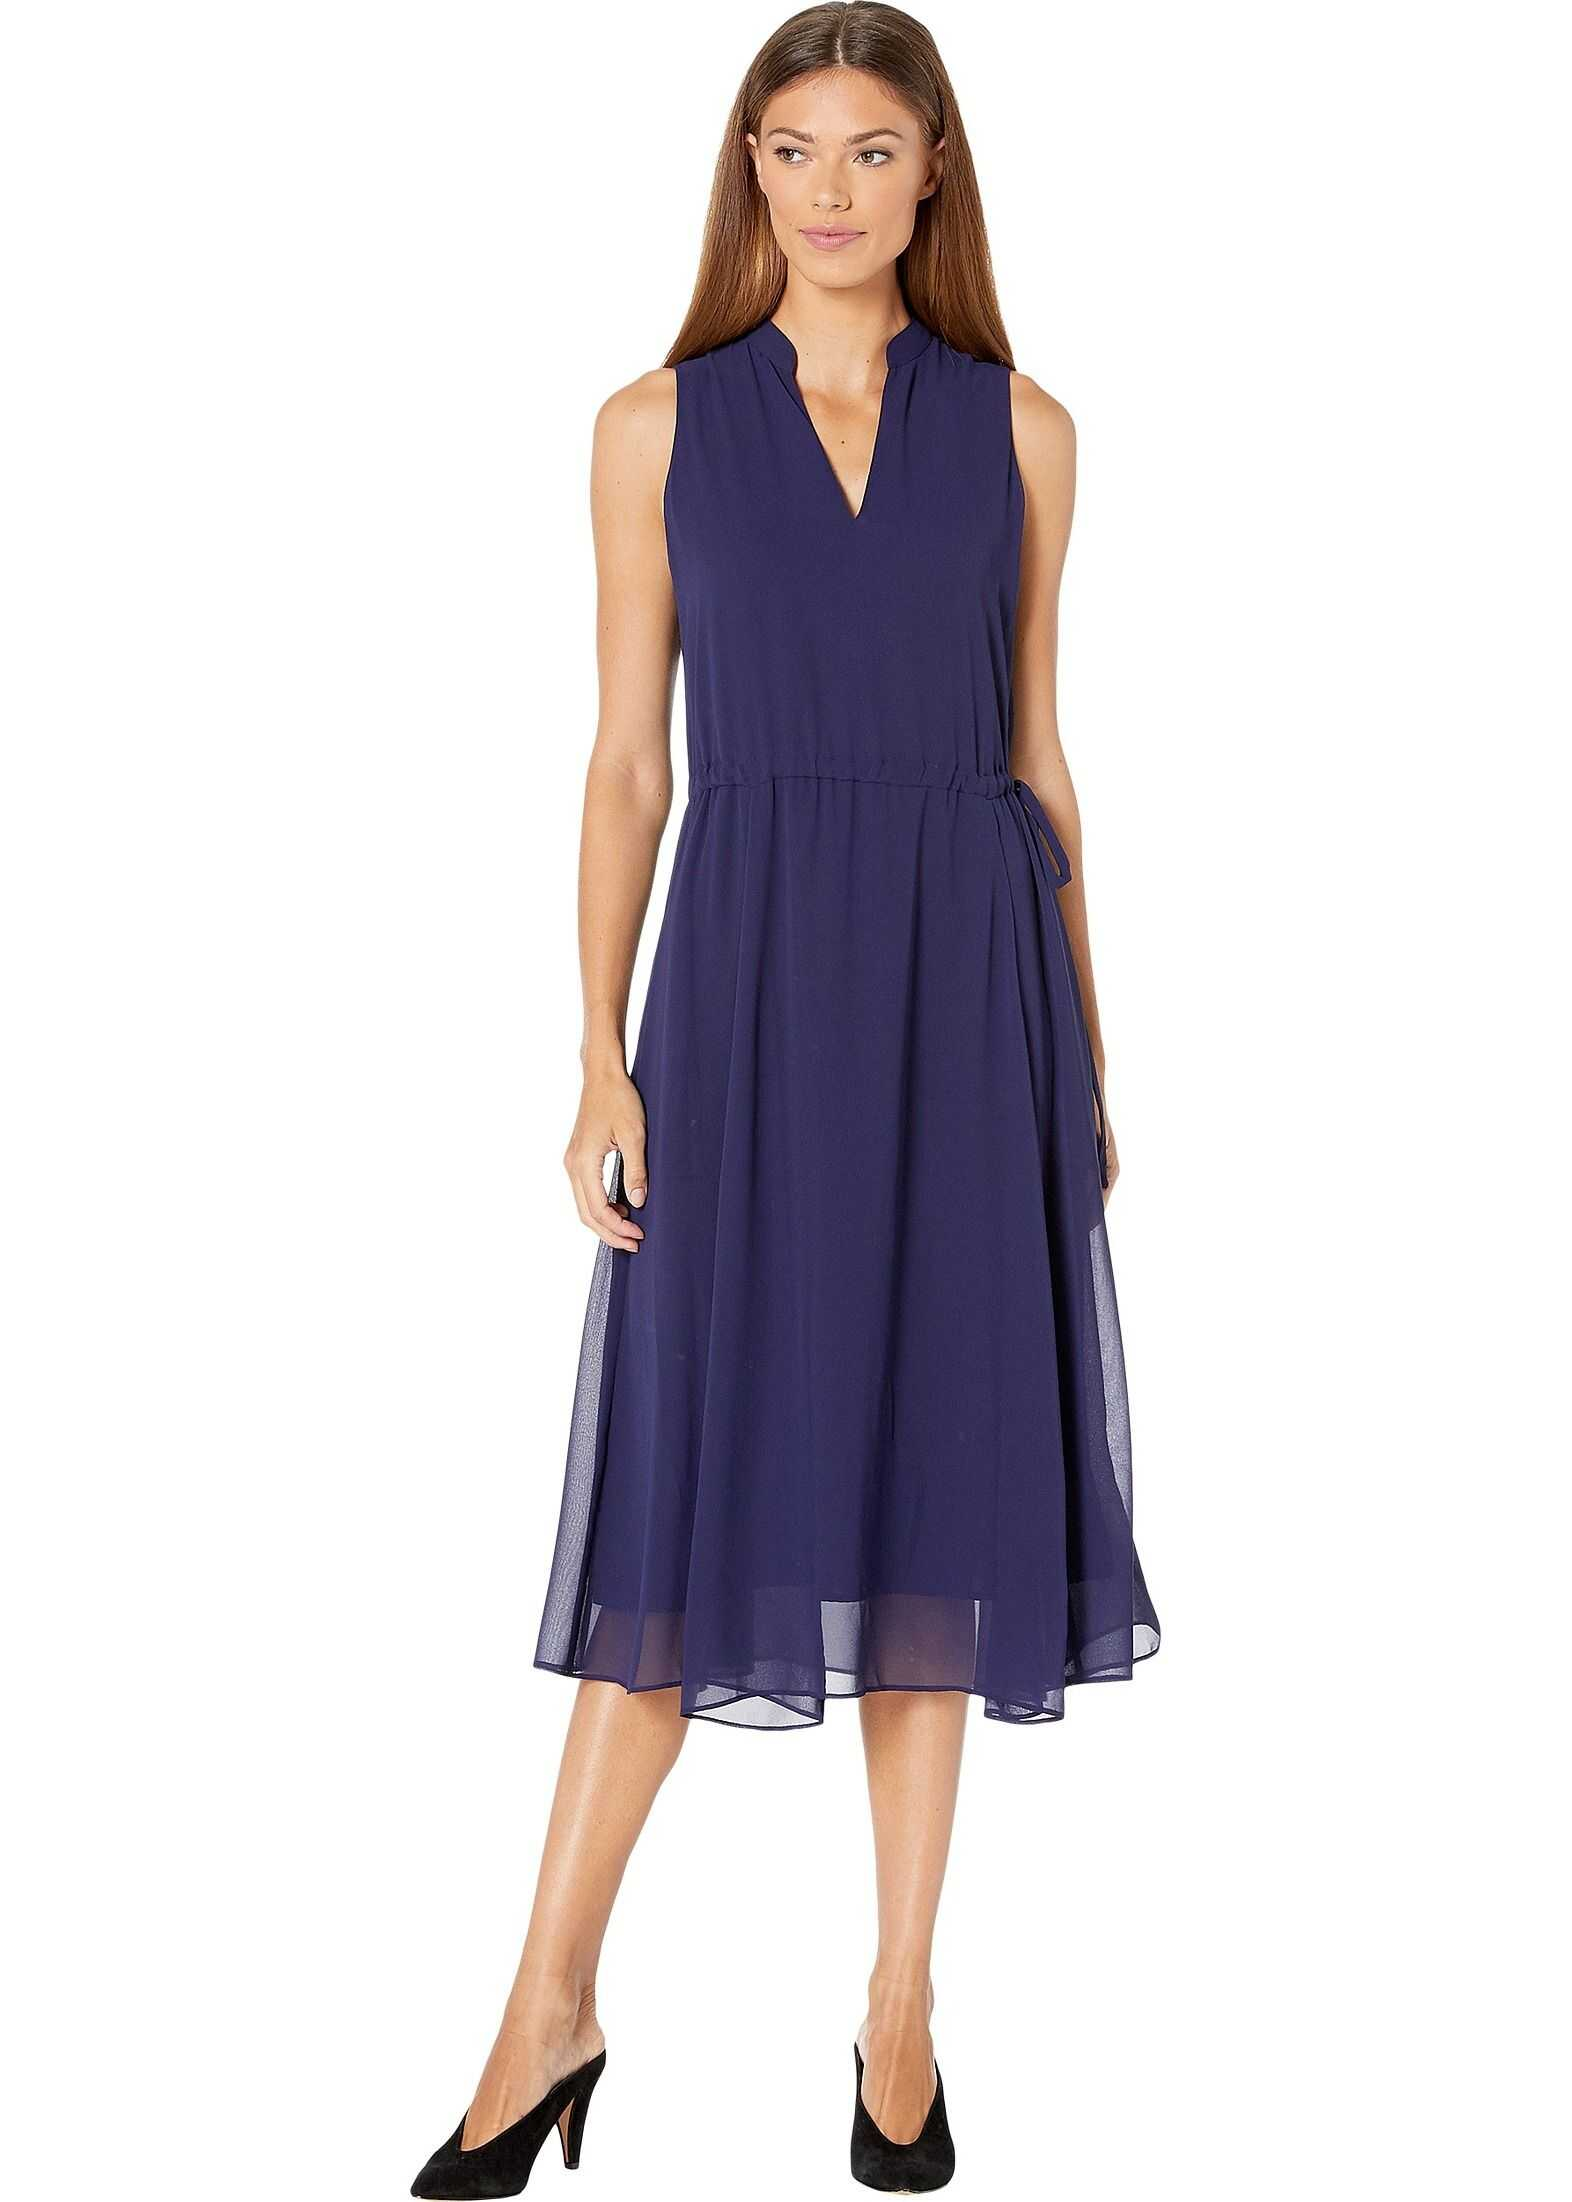 Anne Klein Solid Chiffon Drawstring Midi Dress w/ Lining Navy